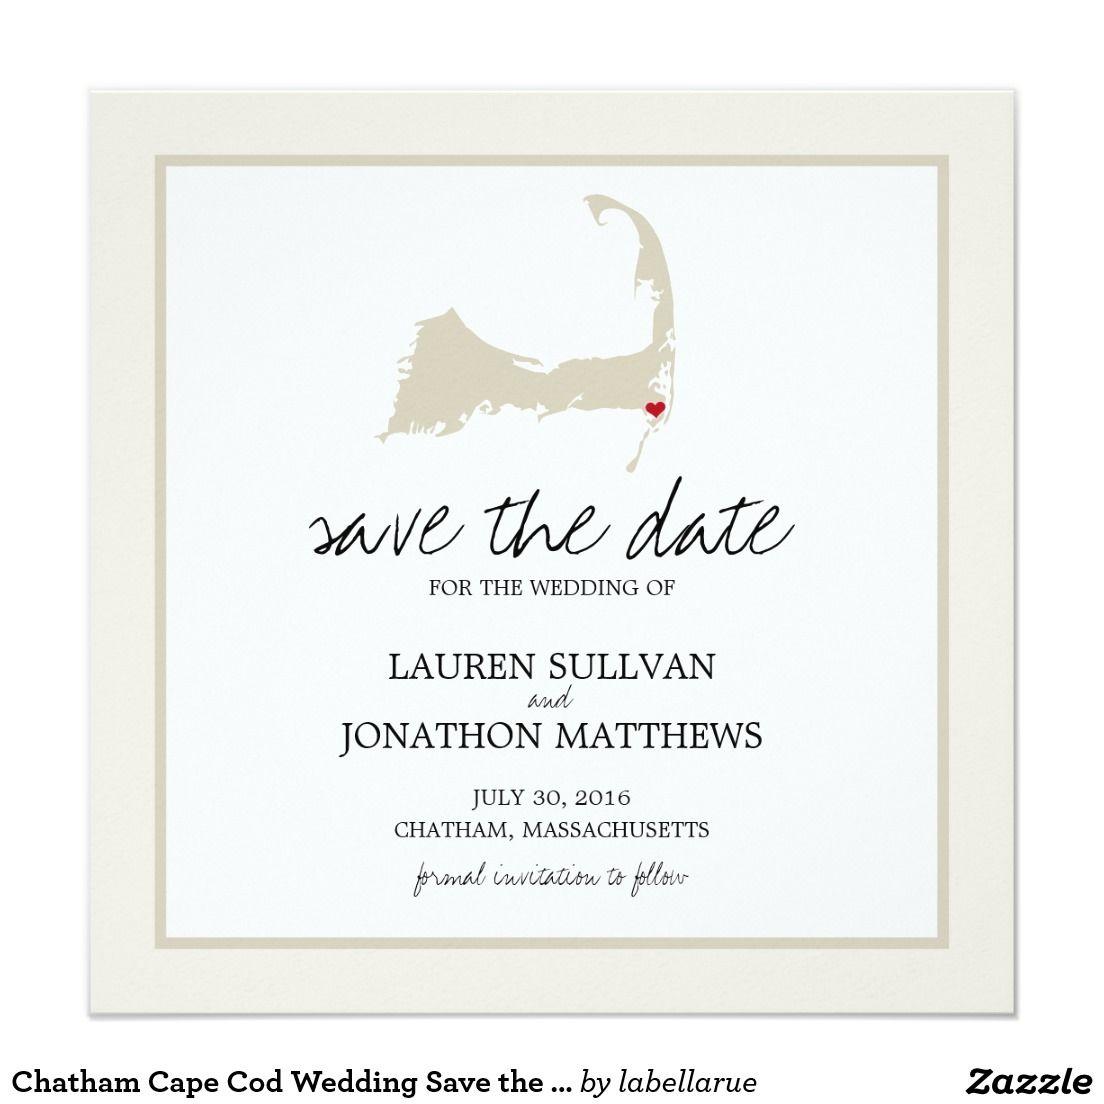 Chatham Cape Cod Wedding Save the Date Invitation | Wedding ideas ...